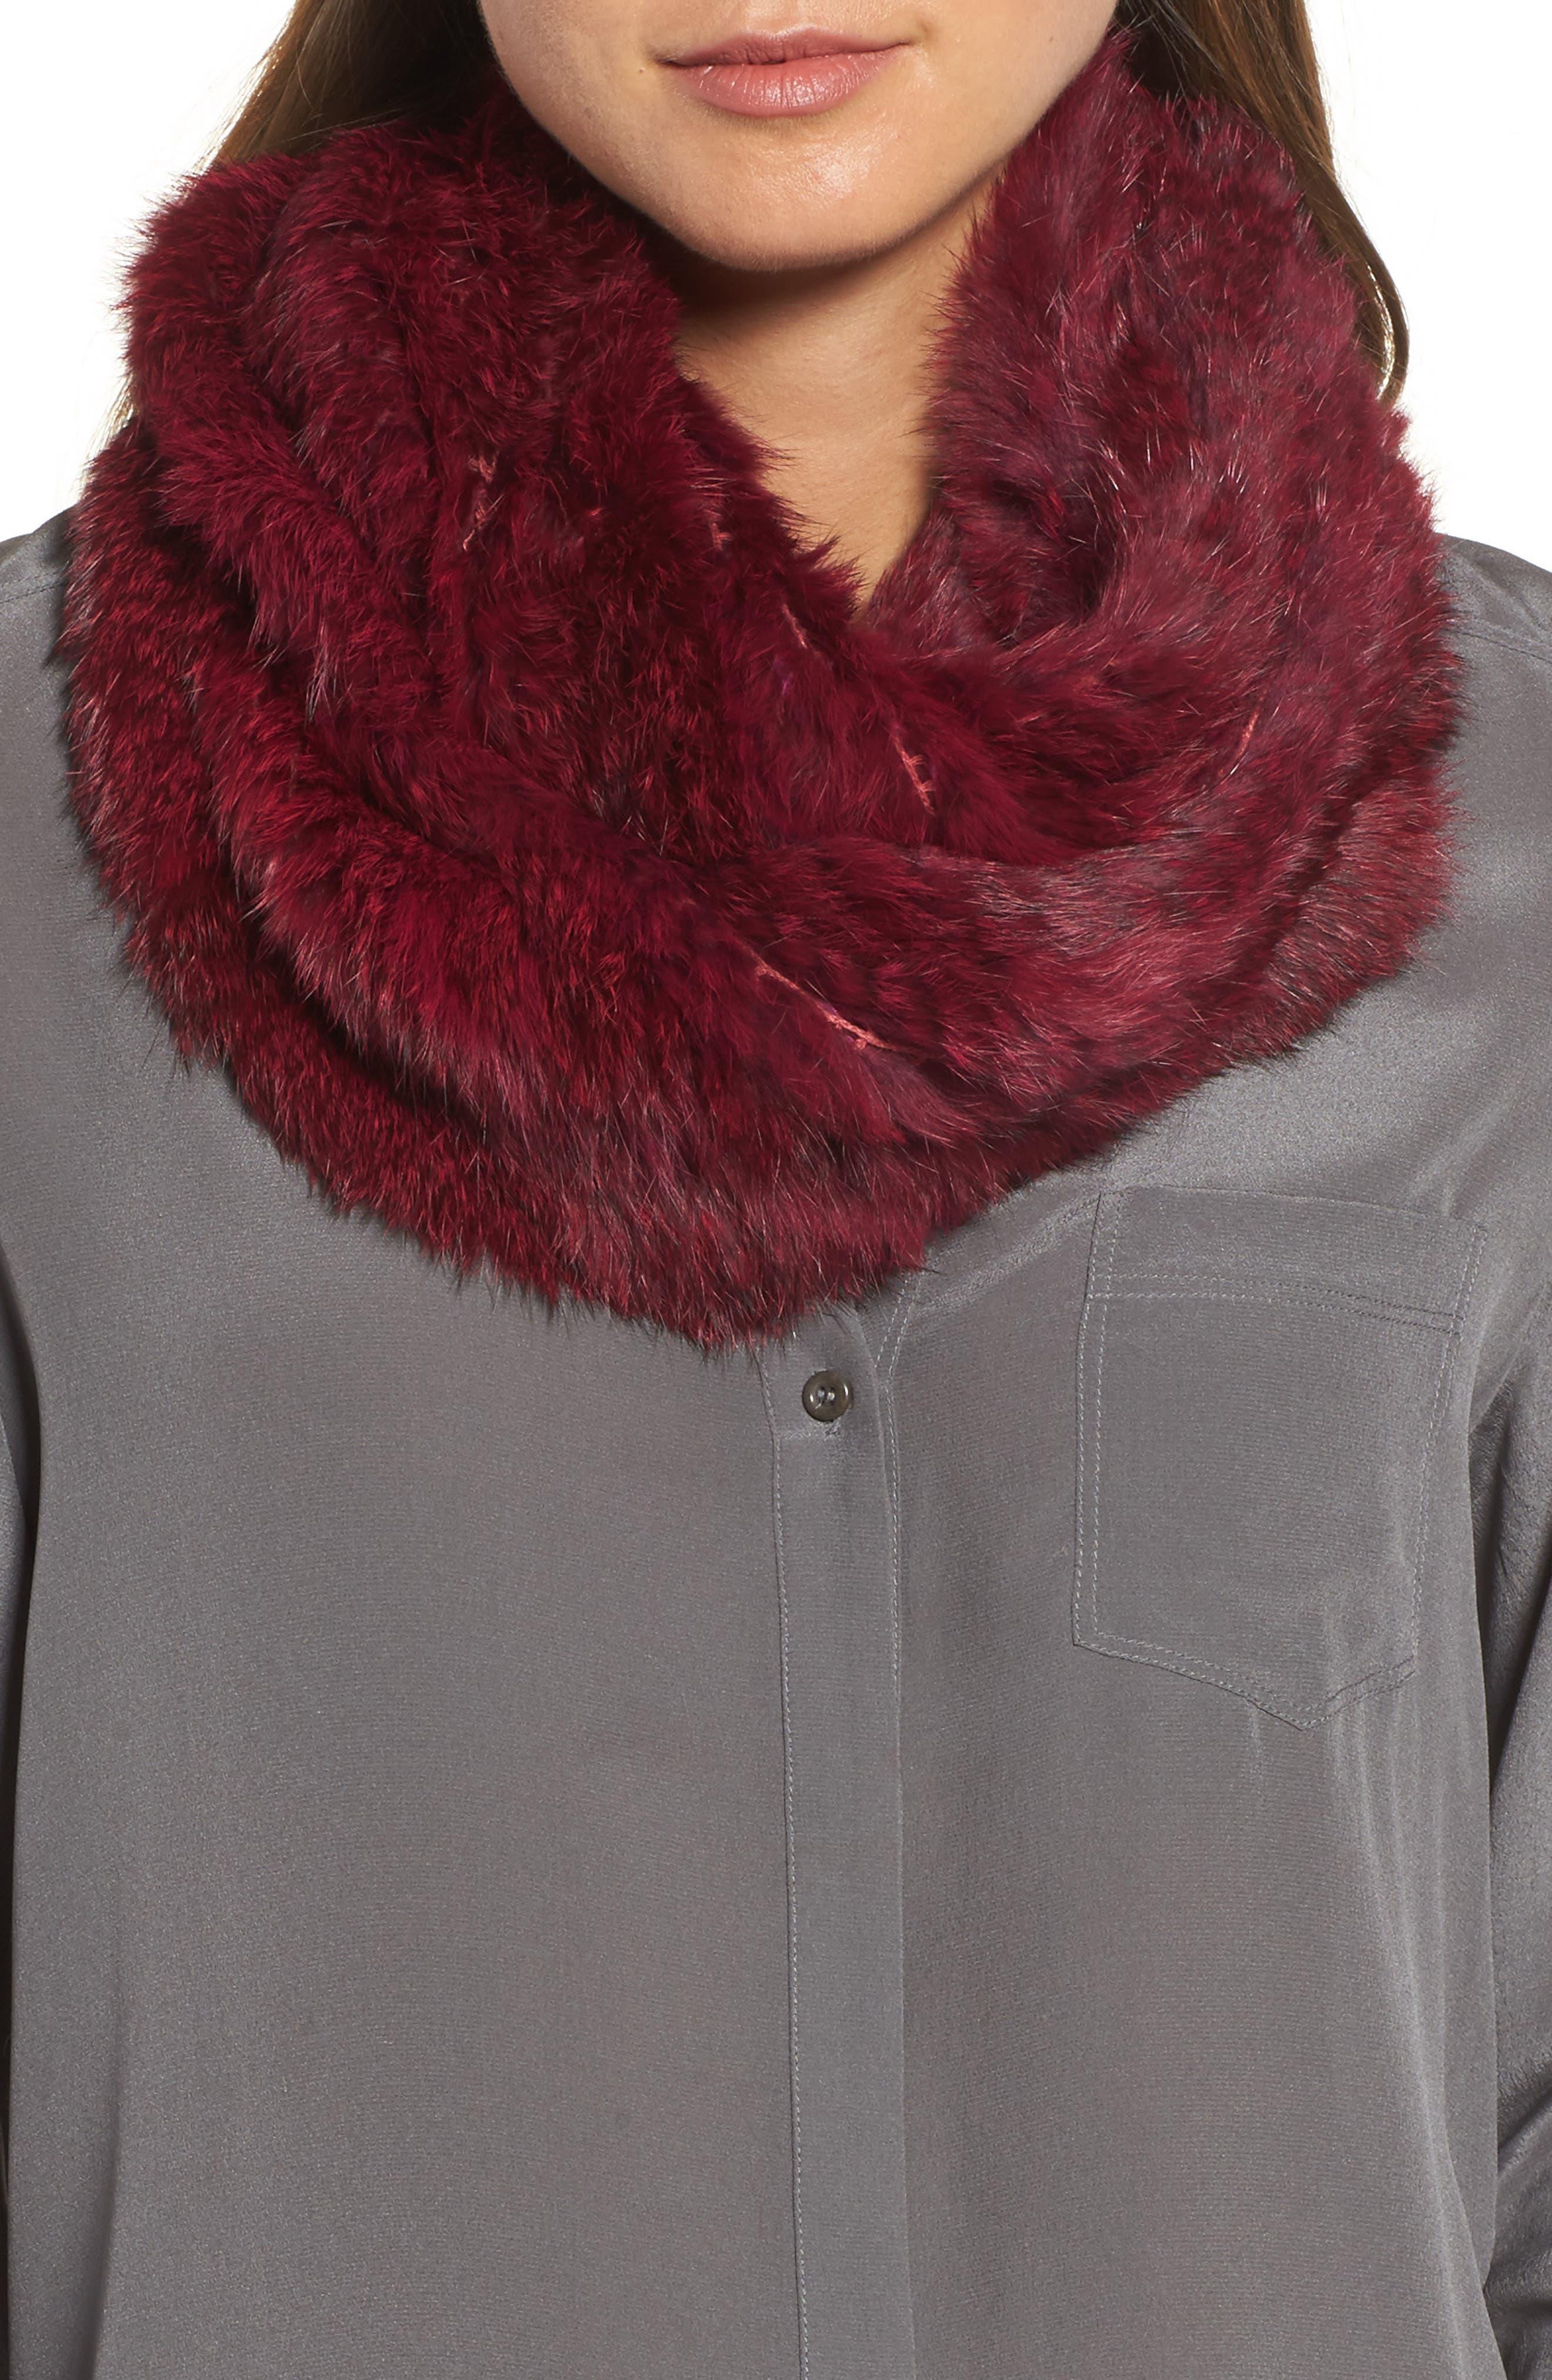 Jocelyn Overdyed Genuine Rabbit Fur Infinity Scarf